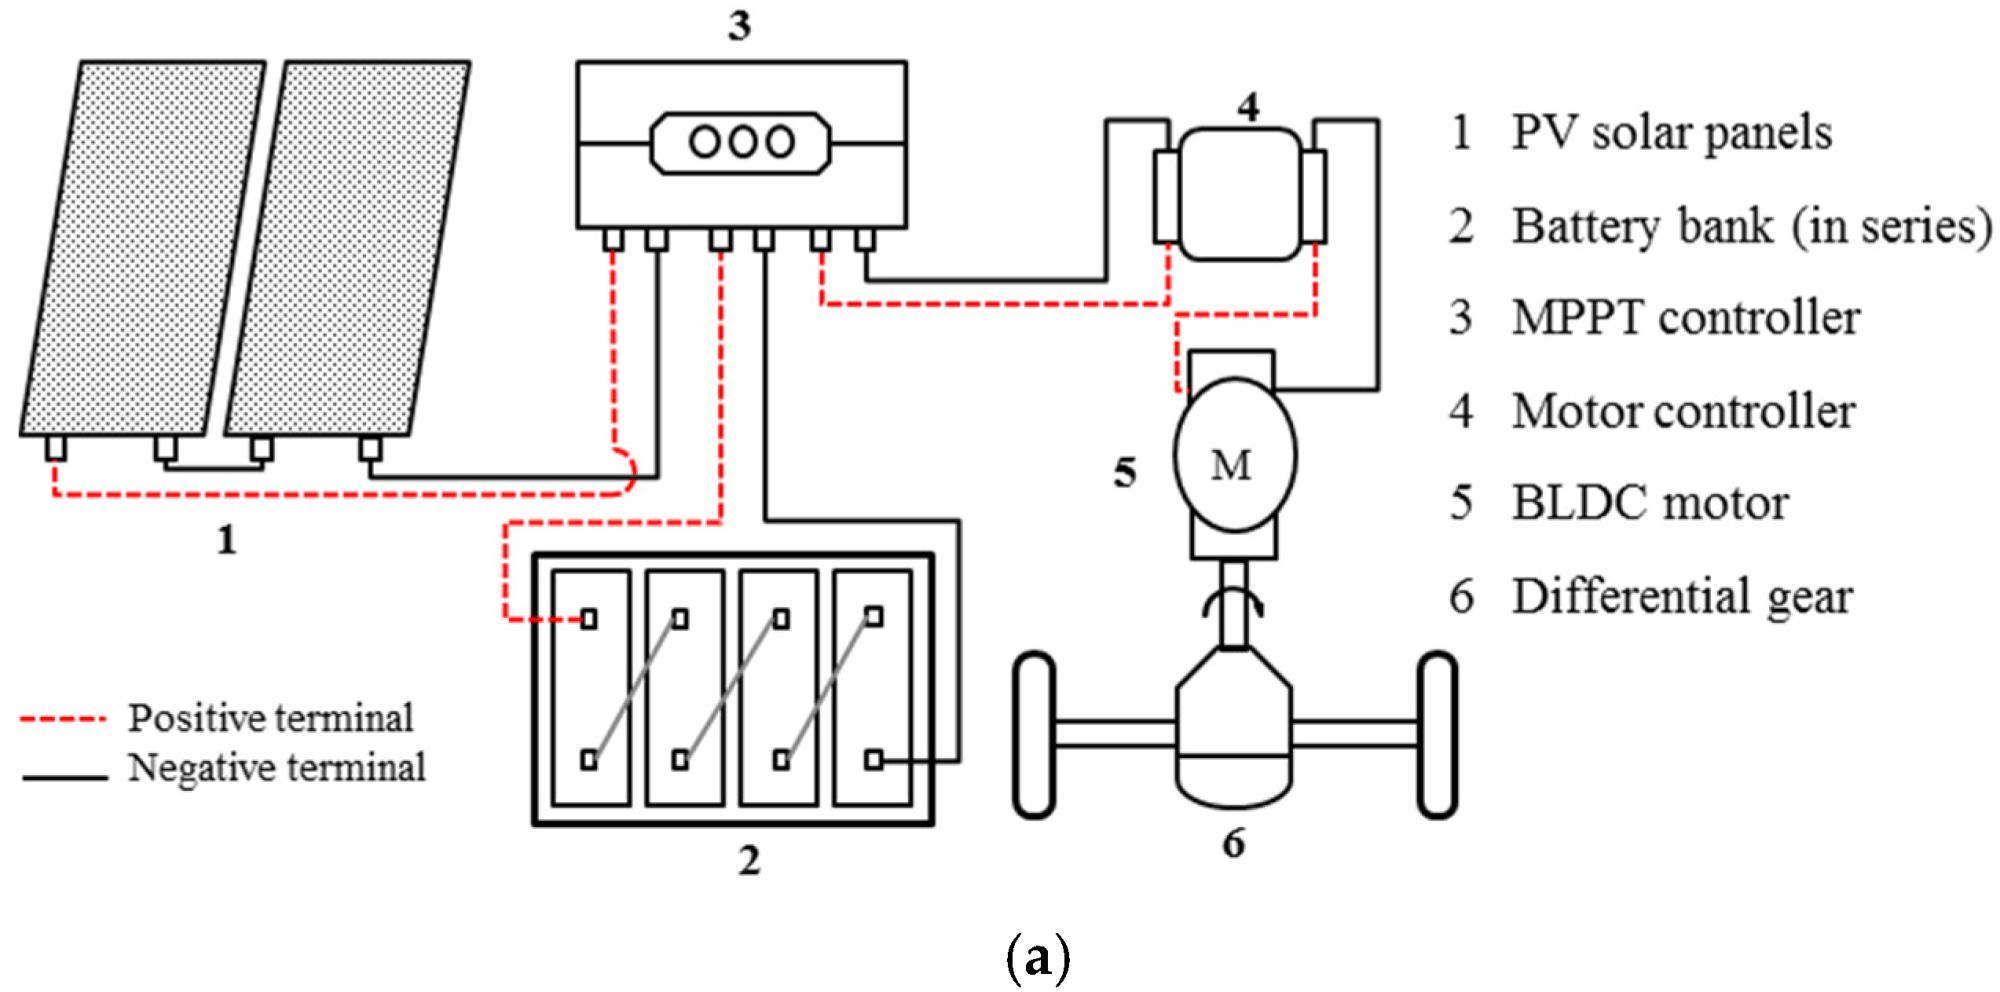 hight resolution of auto rickshaw wiring diagram wiring diagram technic auto rickshaw wiring diagram